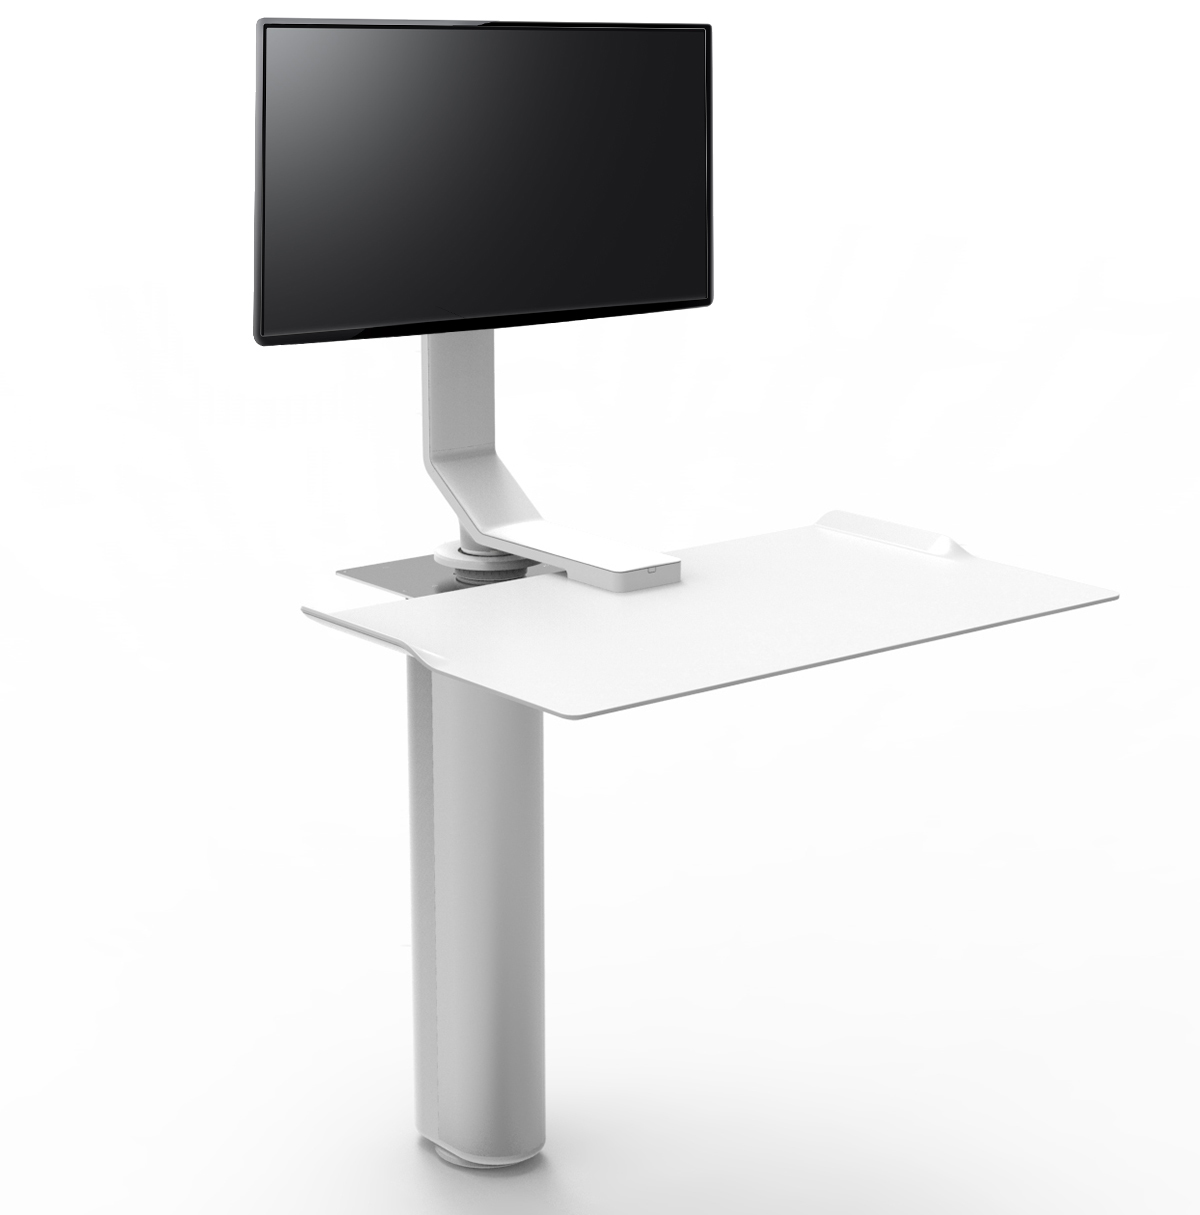 hs_sitstand_QSUD_studio_01.jpg#asset:337201